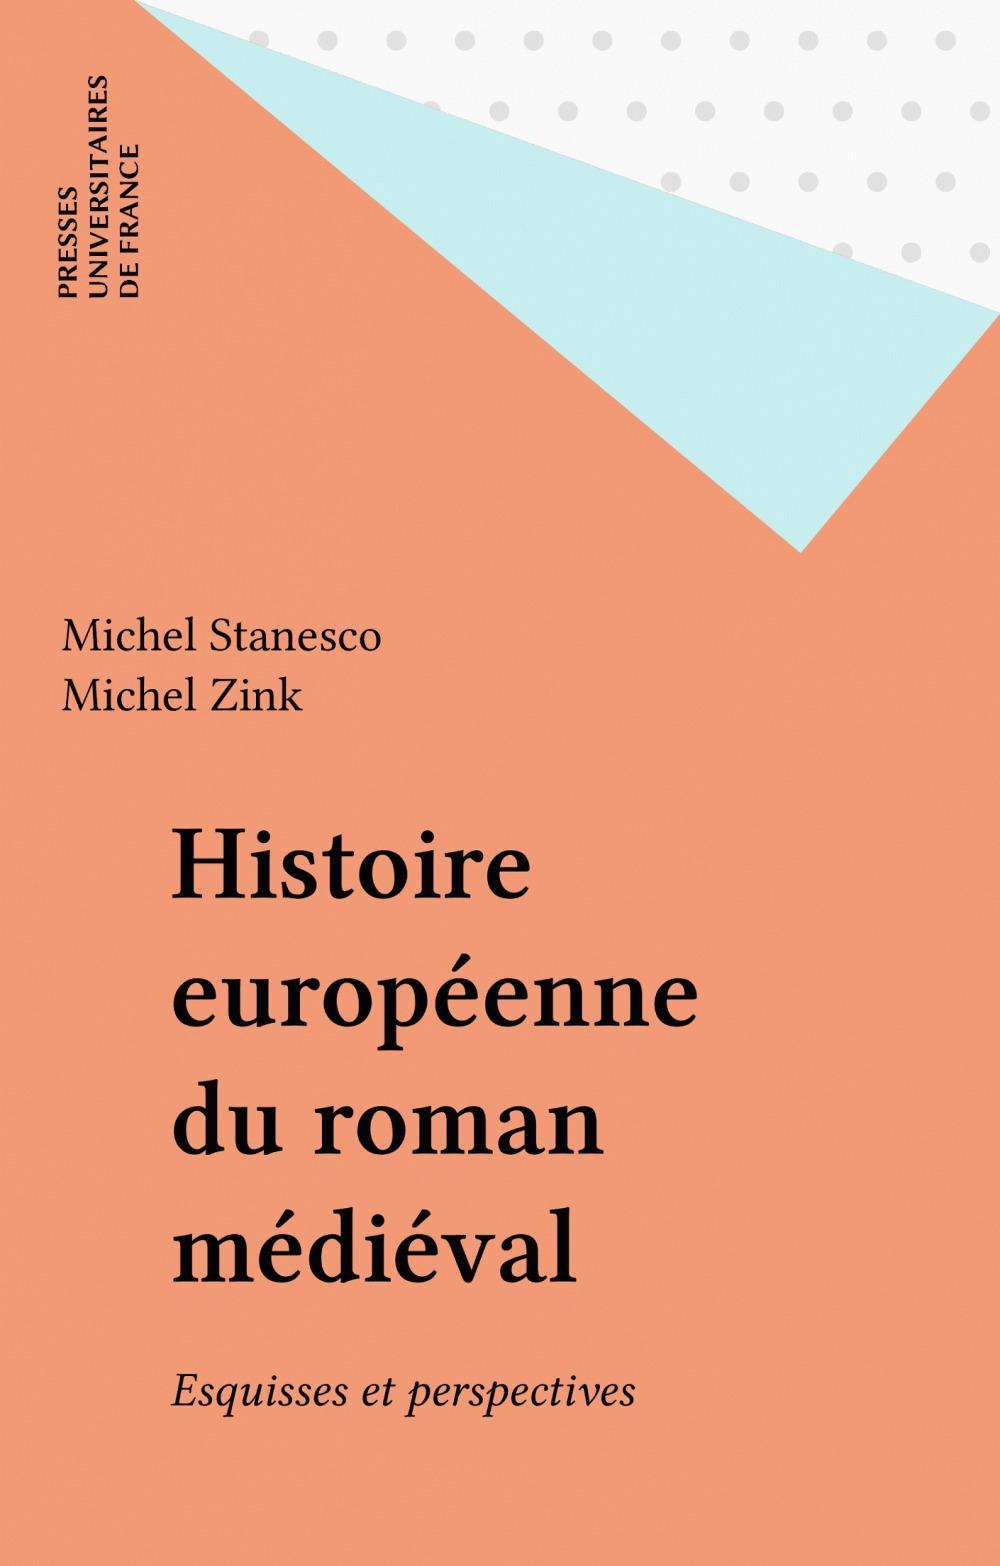 Histoire europeenne du roman medieval